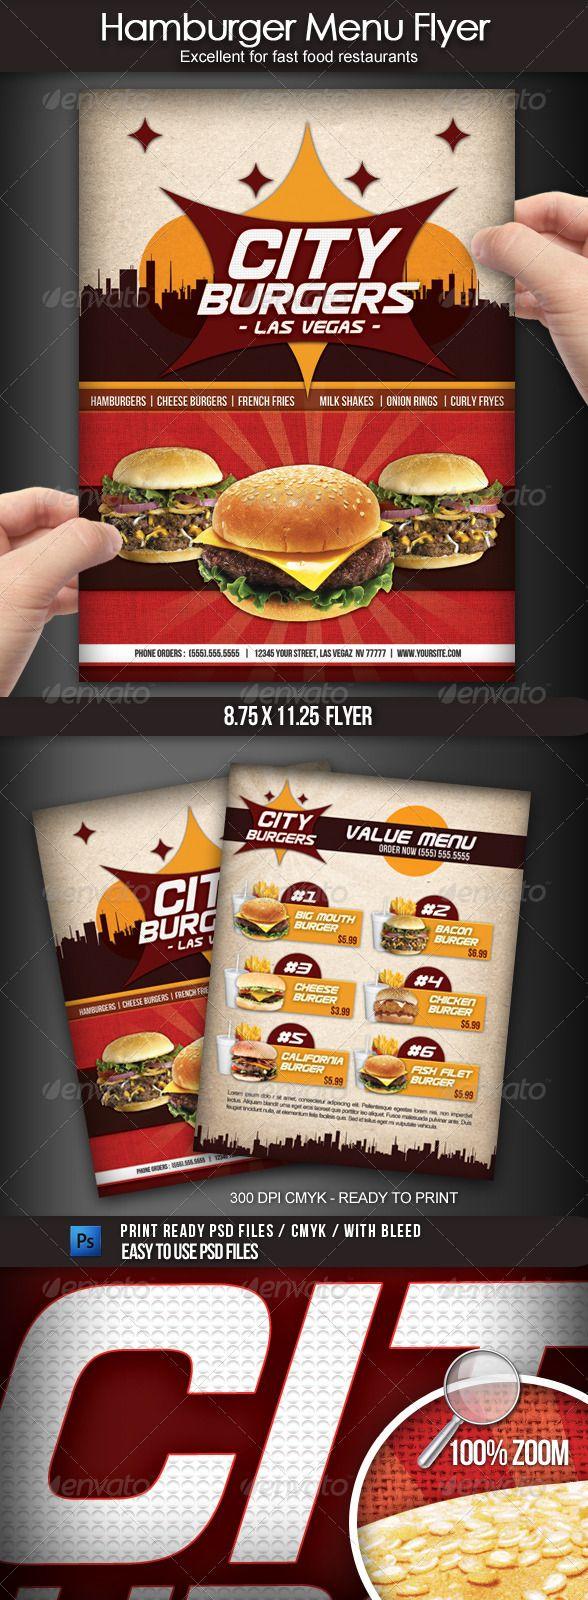 Hamburger Restaurant Menu Flyer